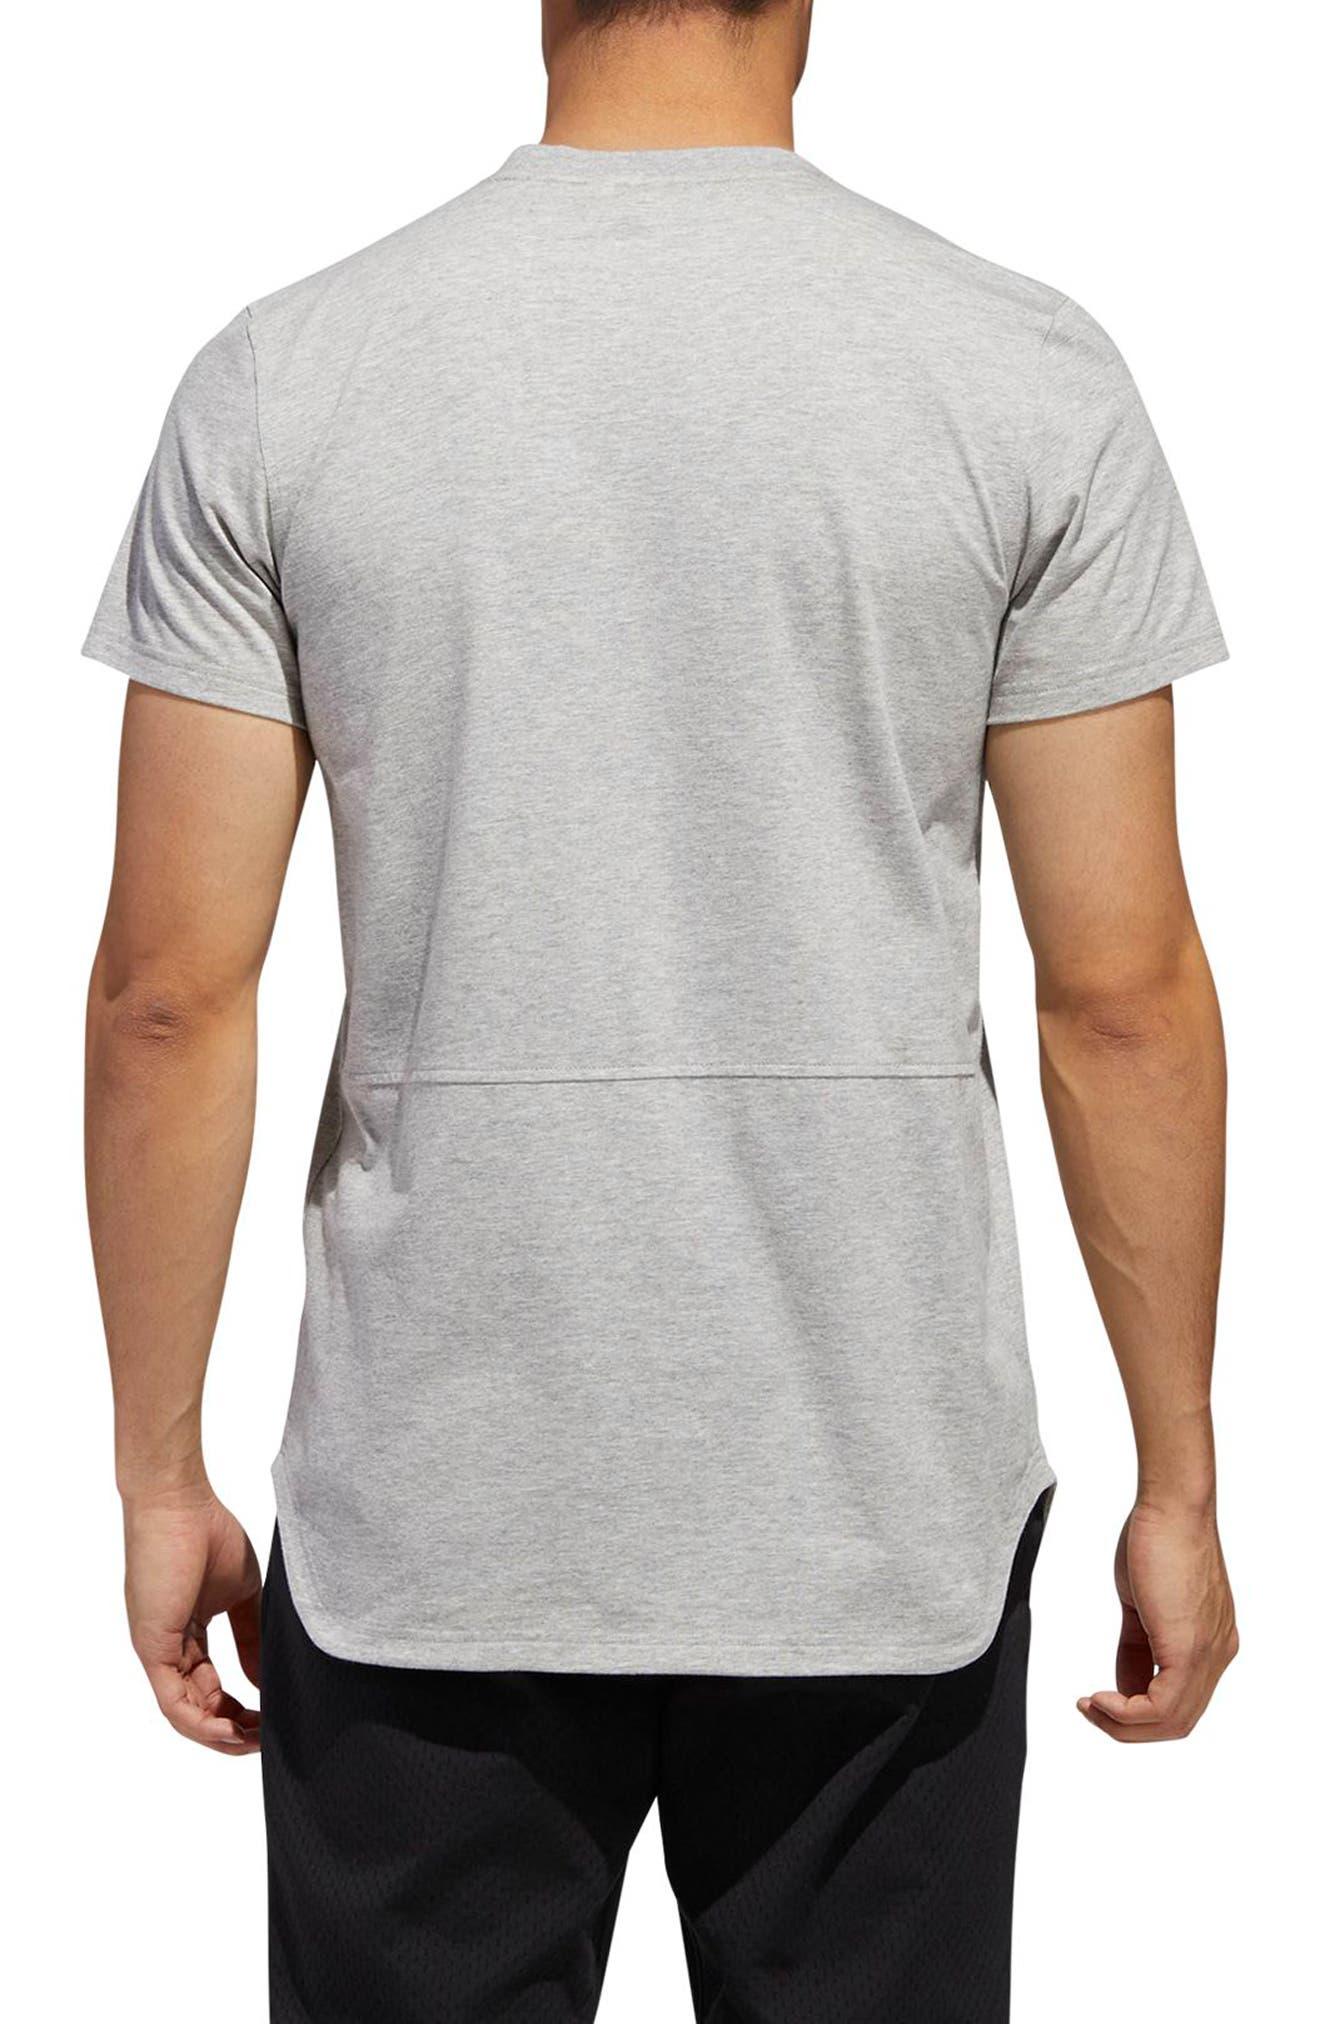 Scoop International T-Shirt,                             Alternate thumbnail 2, color,                             MEDIUM GREY HEATHER